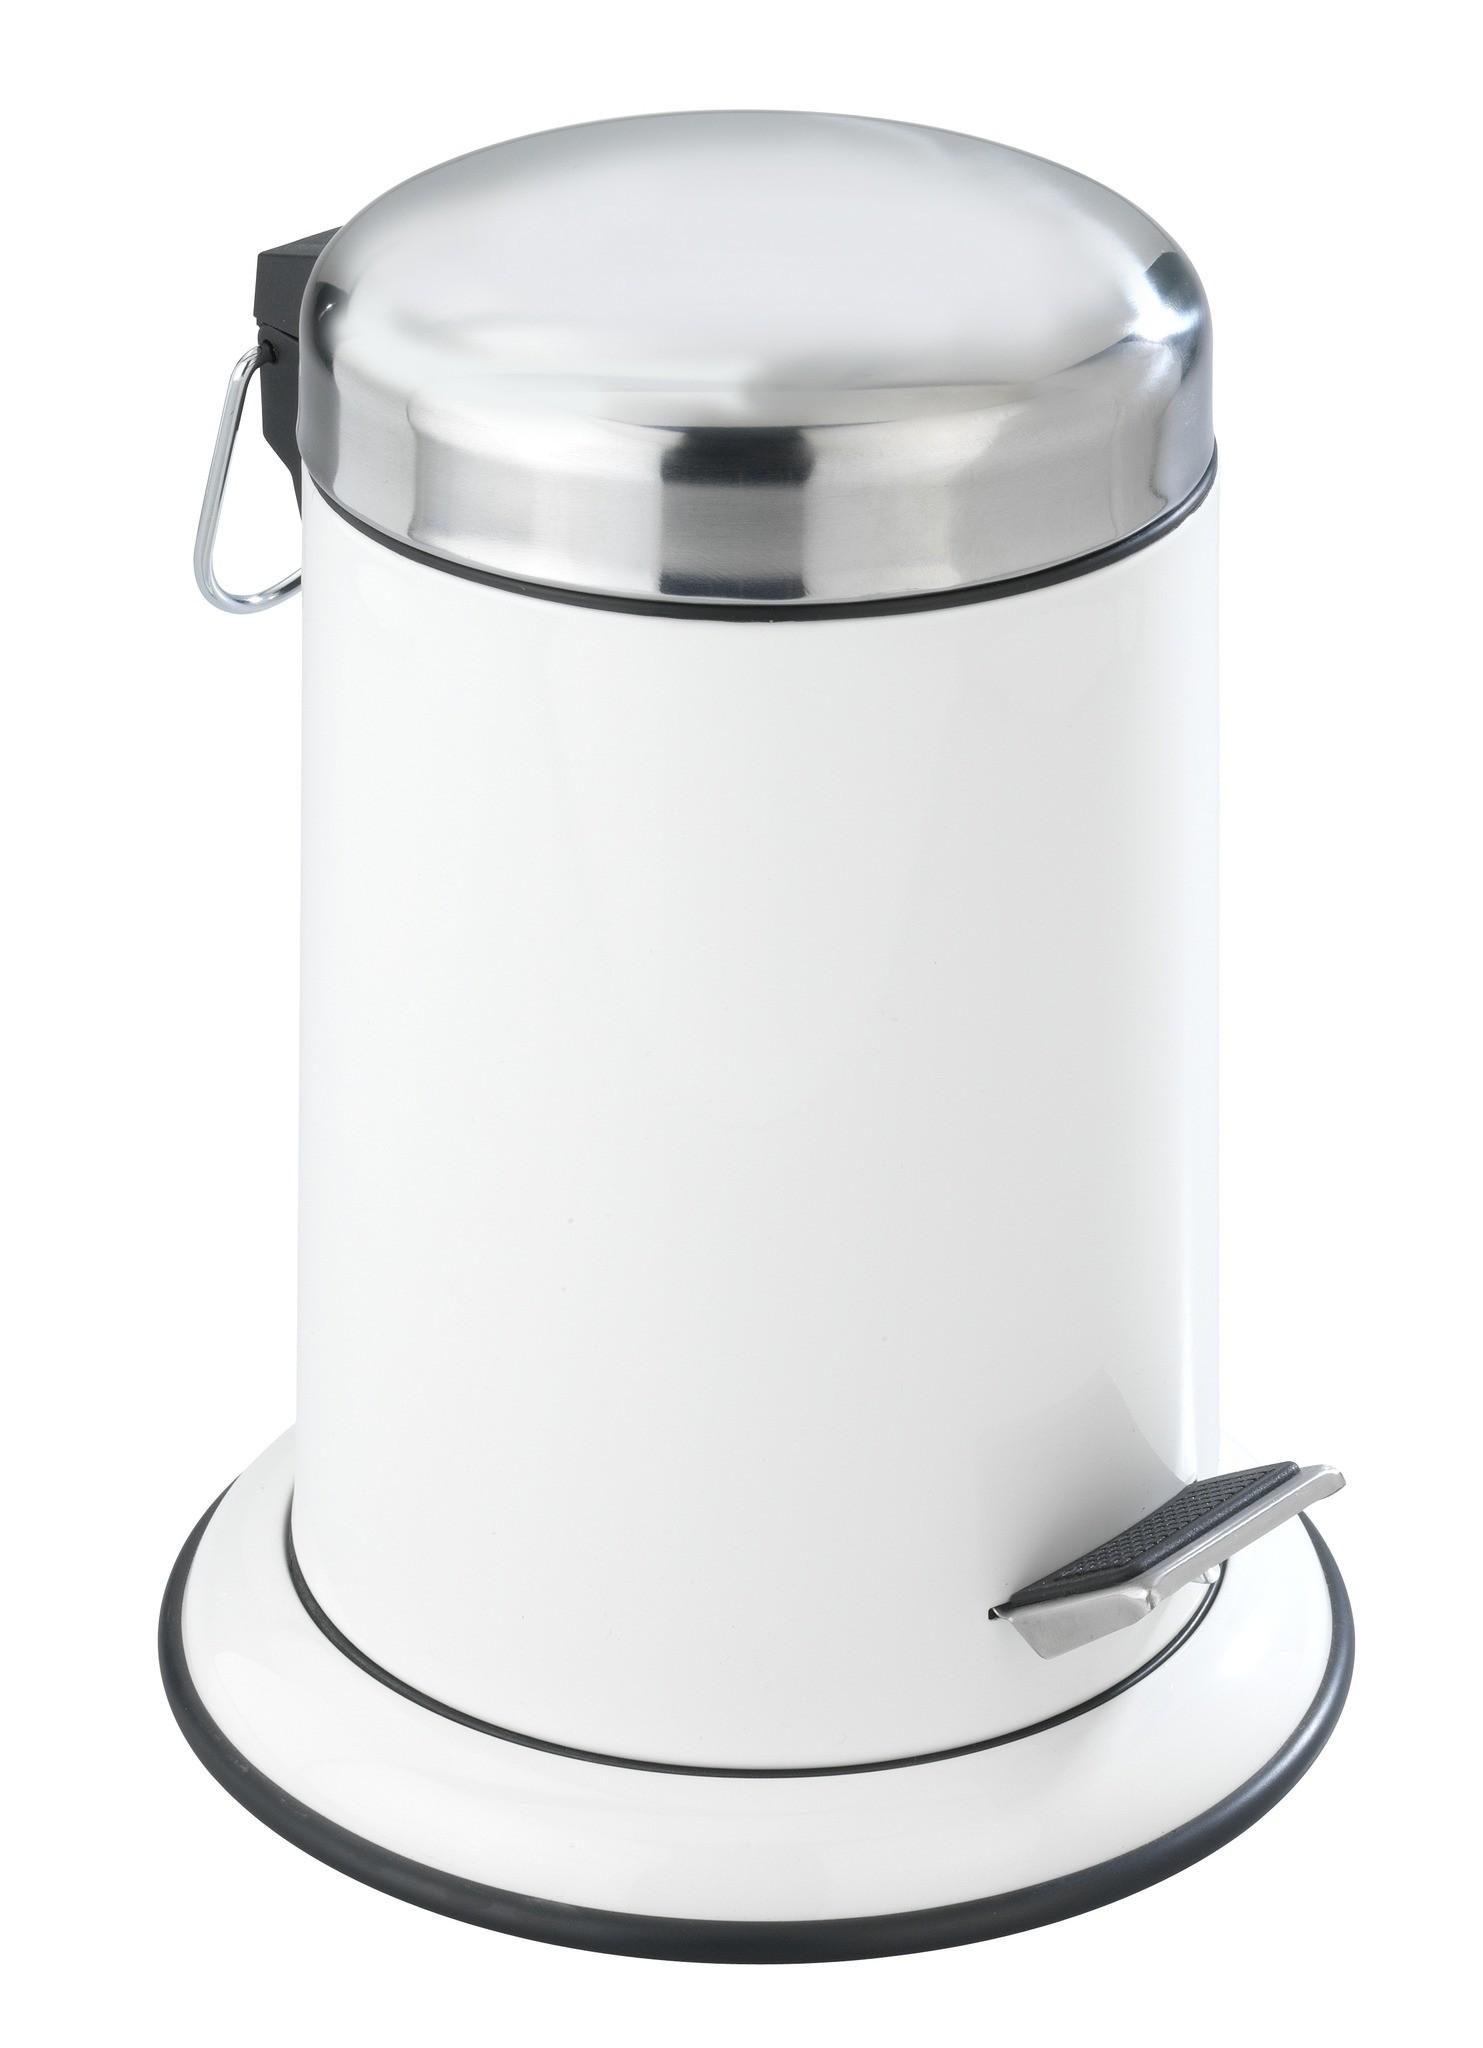 Kosmetik Treteimer Retoro Weiß, 3 Liter, Edelstahl rostfrei